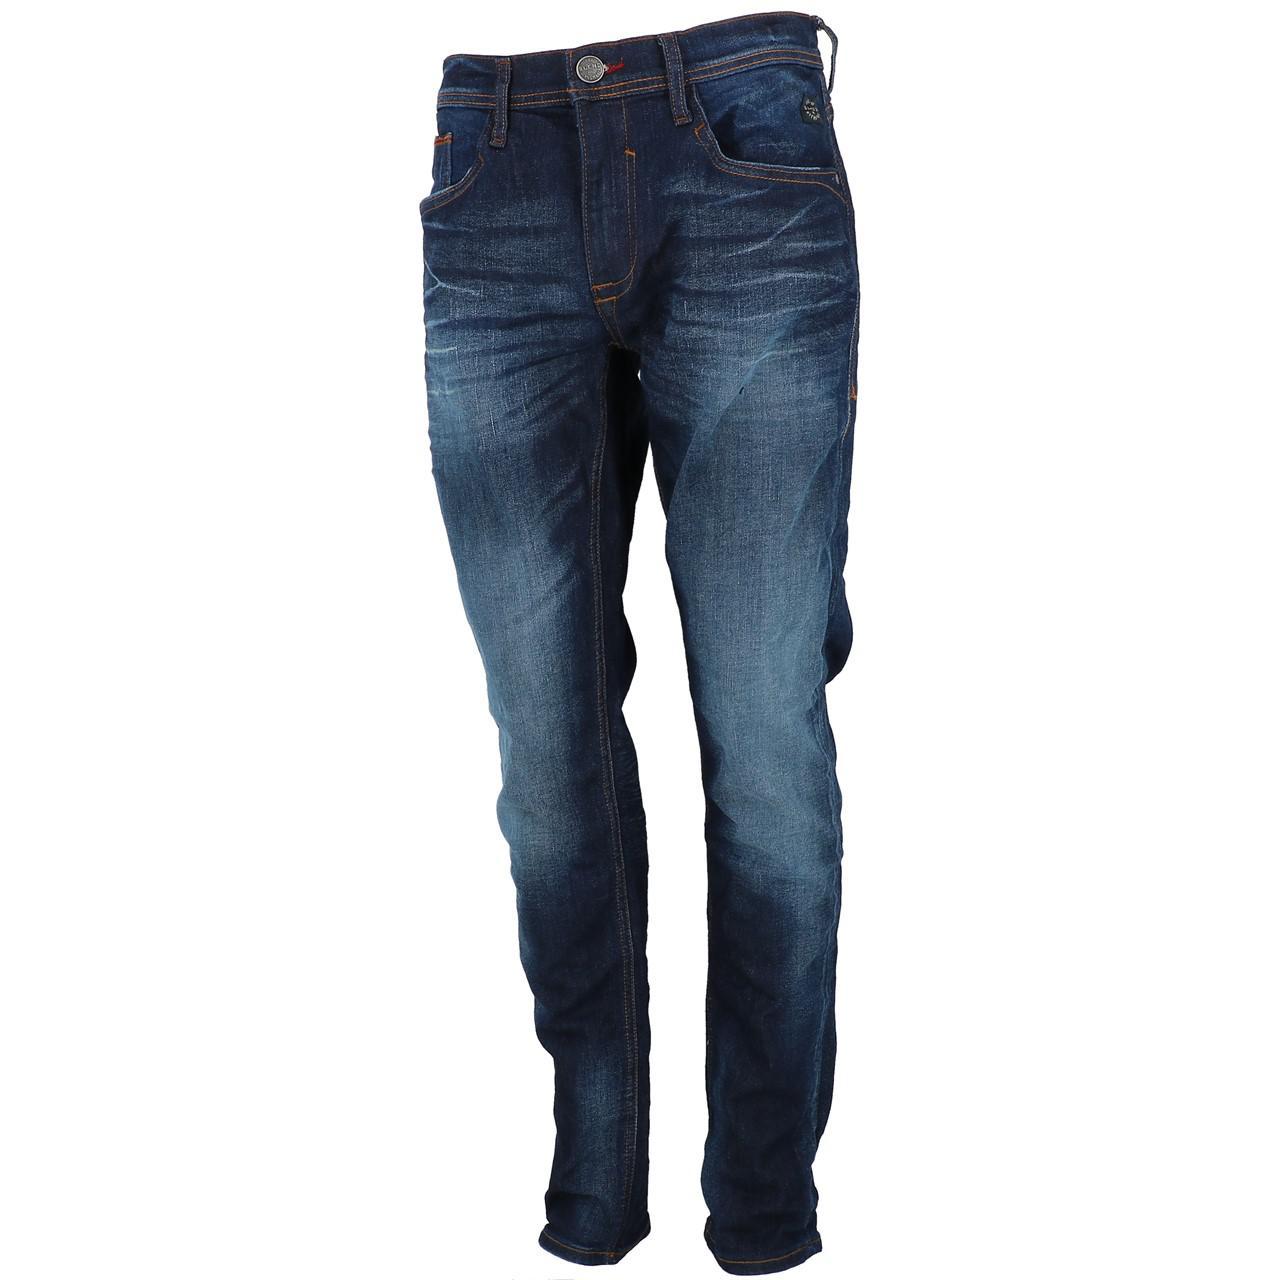 Jeans-Pants-Slim-Blend-Twister-34-Denim-Dark-Reg-Blue-25943-New